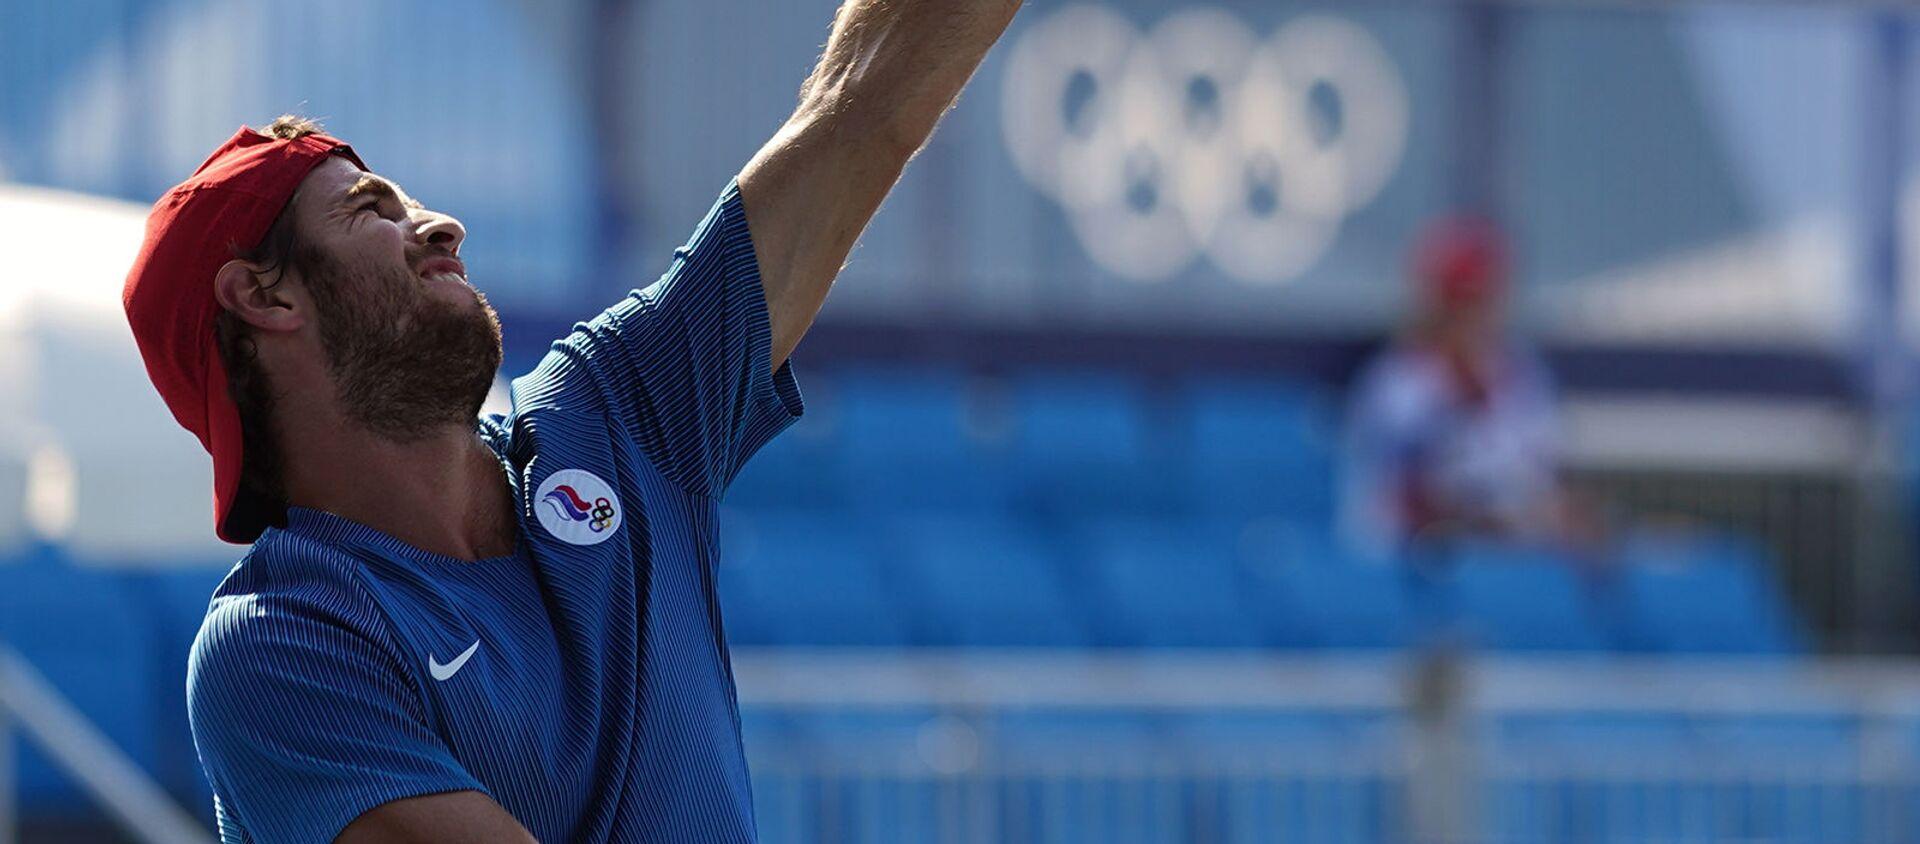 Российский теннисист Карен Хачанов в матче 1-го круга мужского парного разряда против Раджива Рама и Фрэнсиса Тиафо (США) на XXXII летних Олимпийских играх в Токио - Sputnik Արմենիա, 1920, 27.07.2021